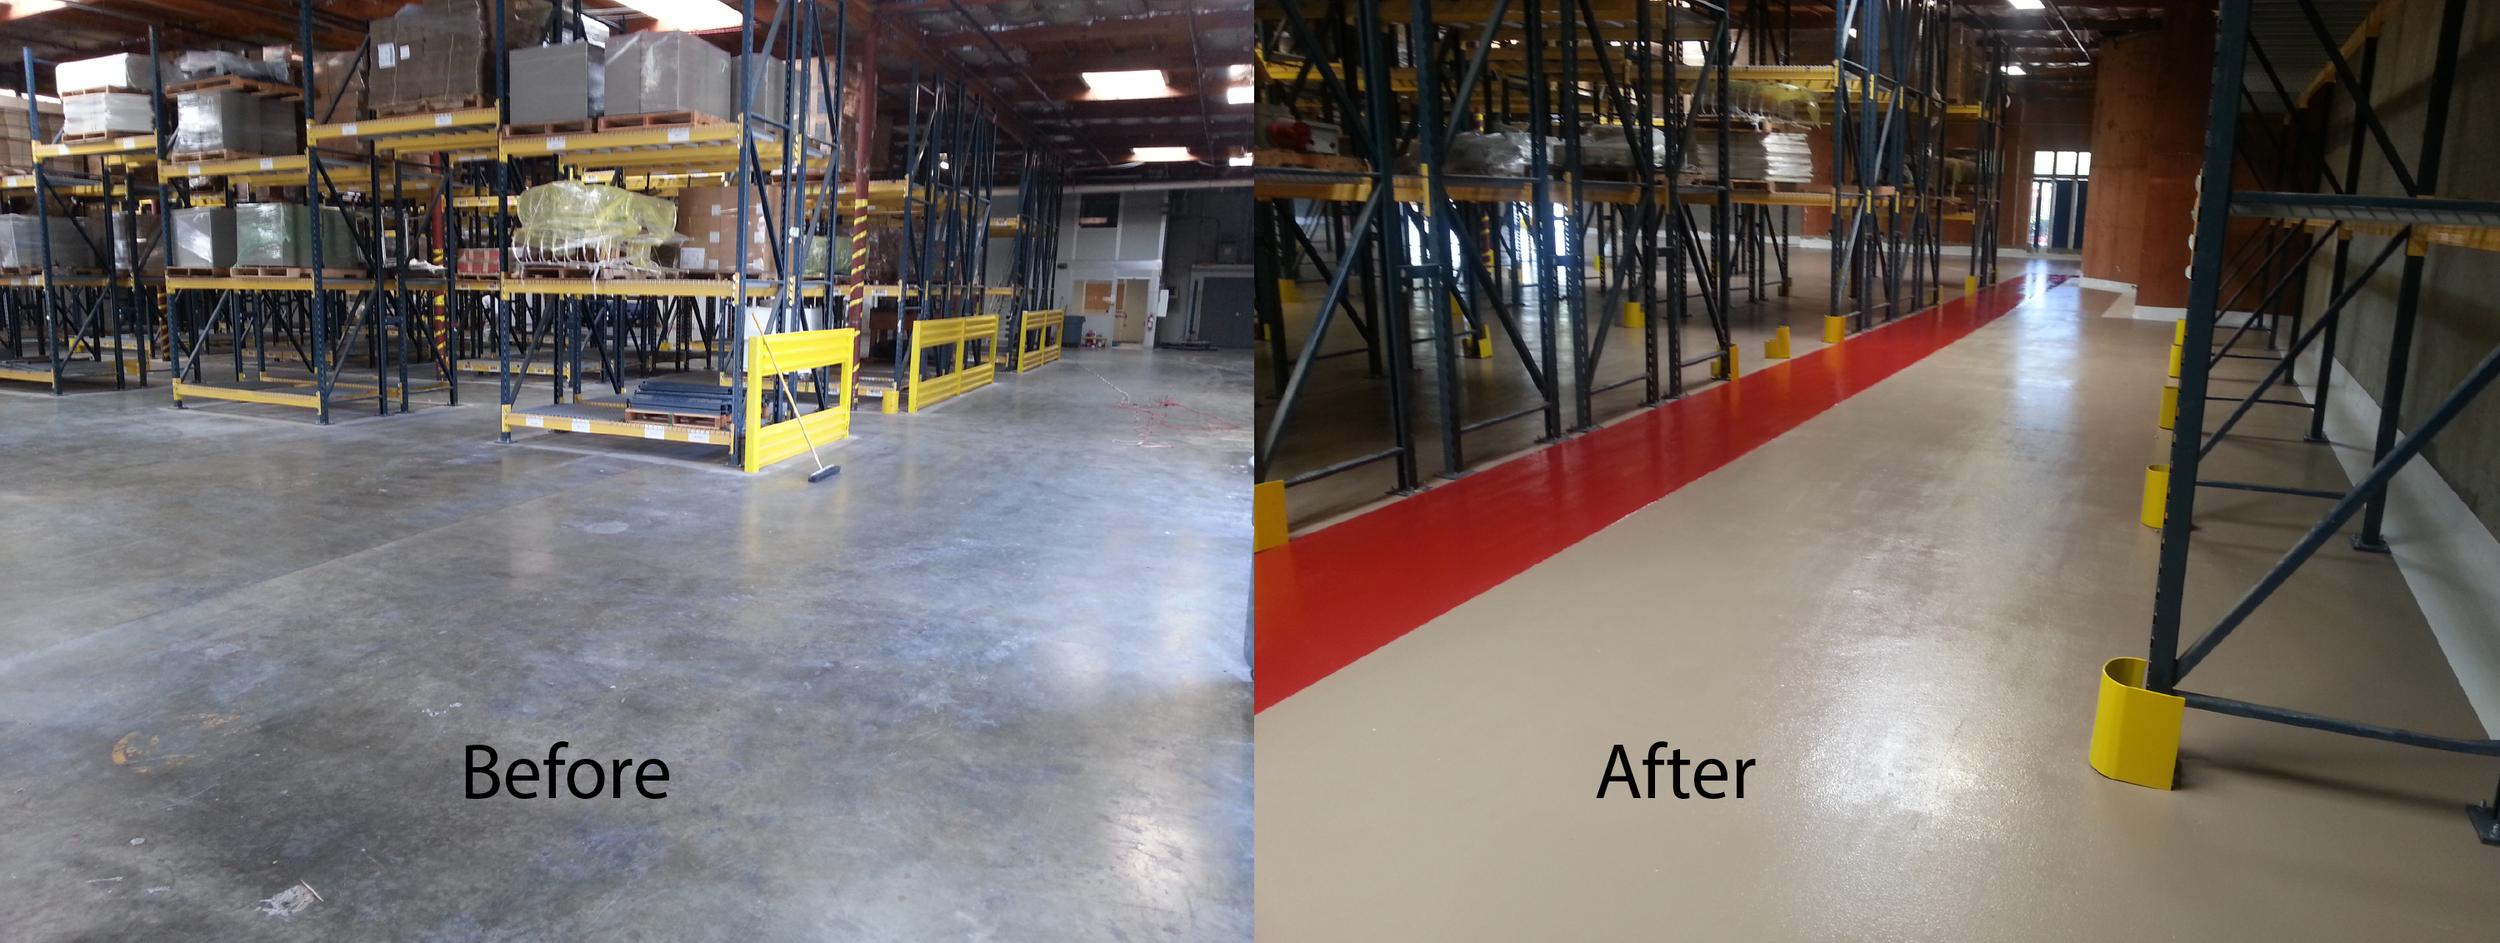 keech-painting-epoxy-floor-coffee-warehouse.png